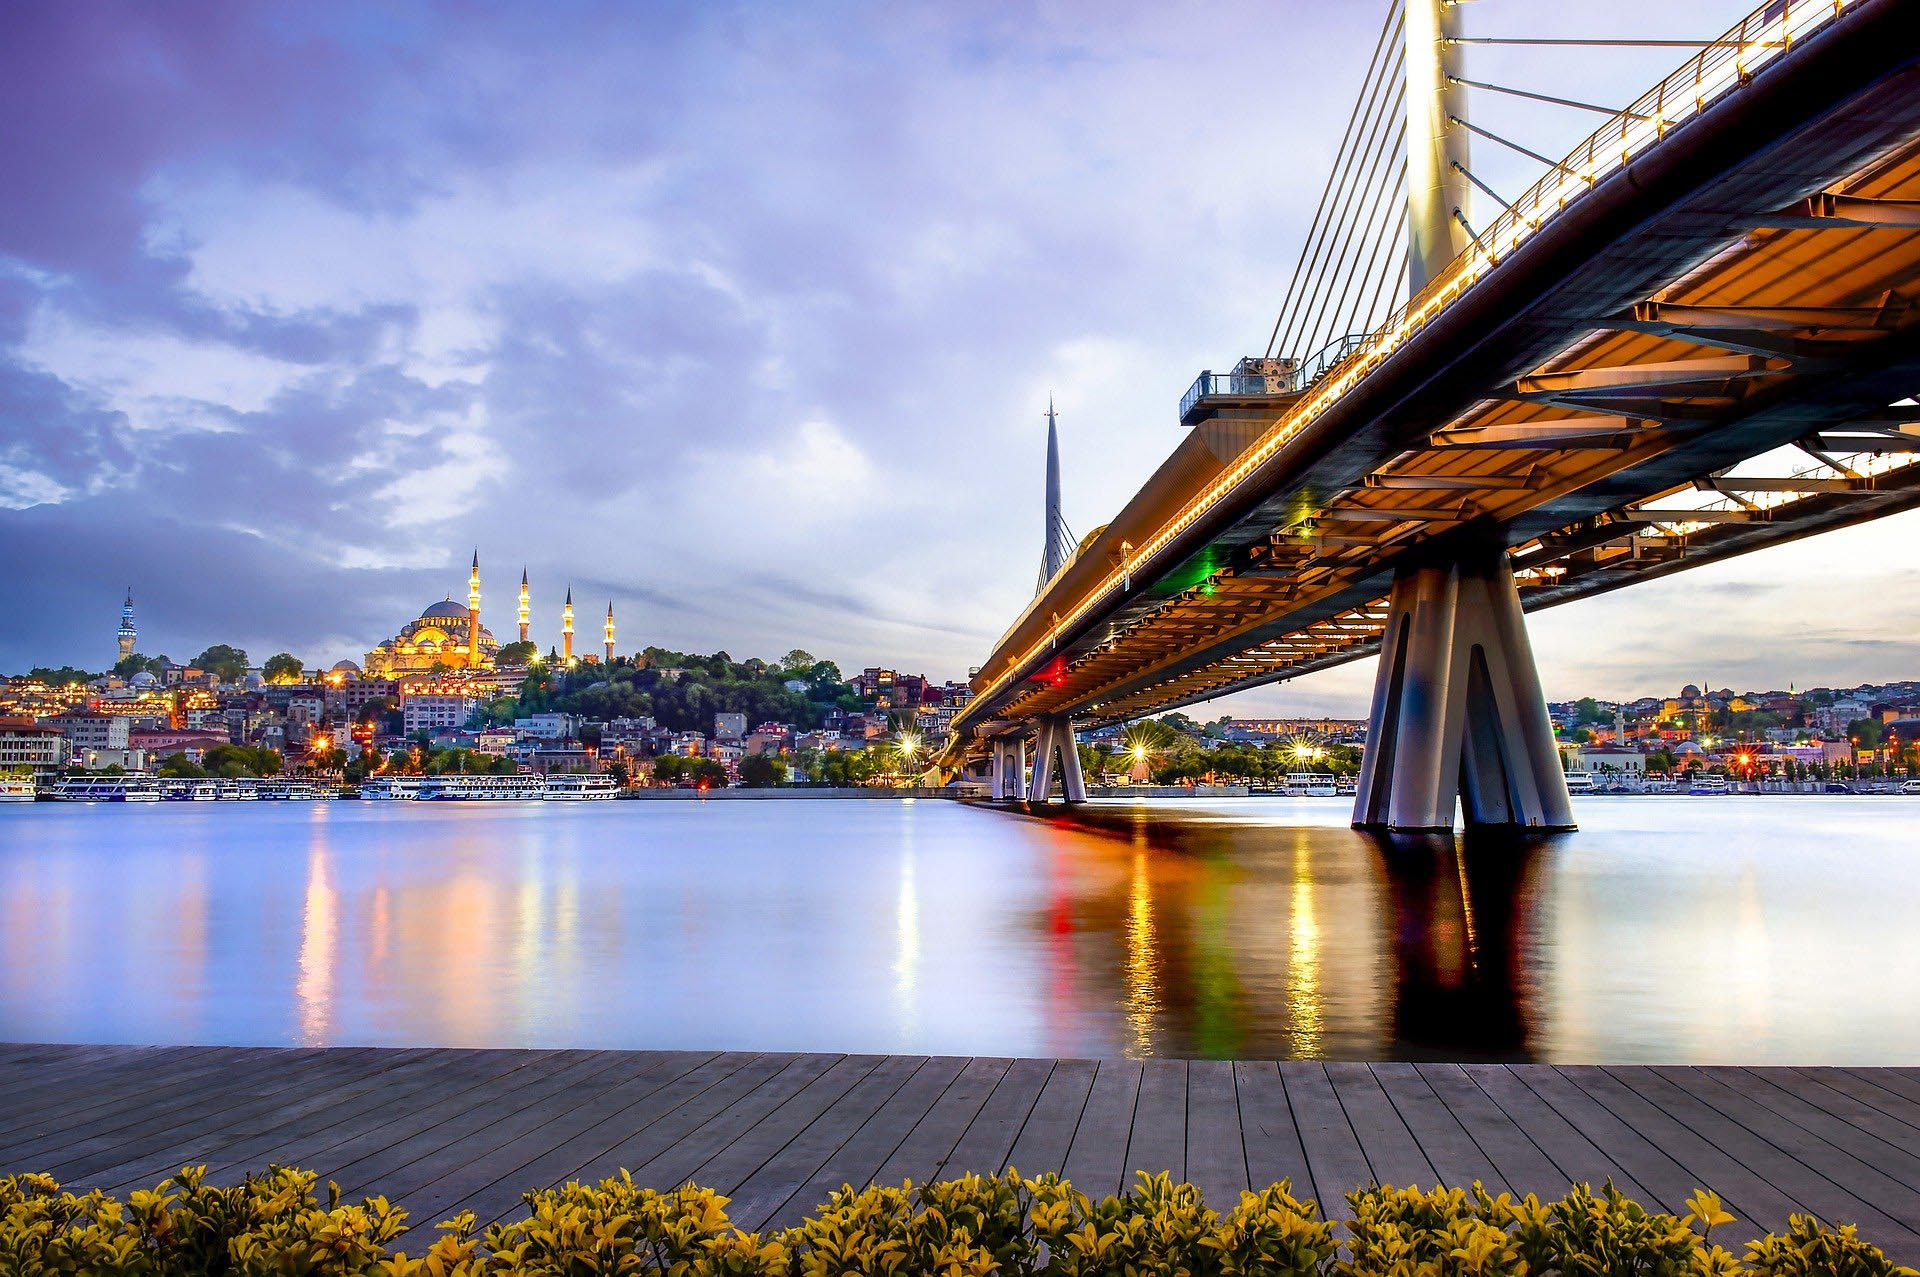 2021 Formula 1 Turkish Grand Prix travel packages